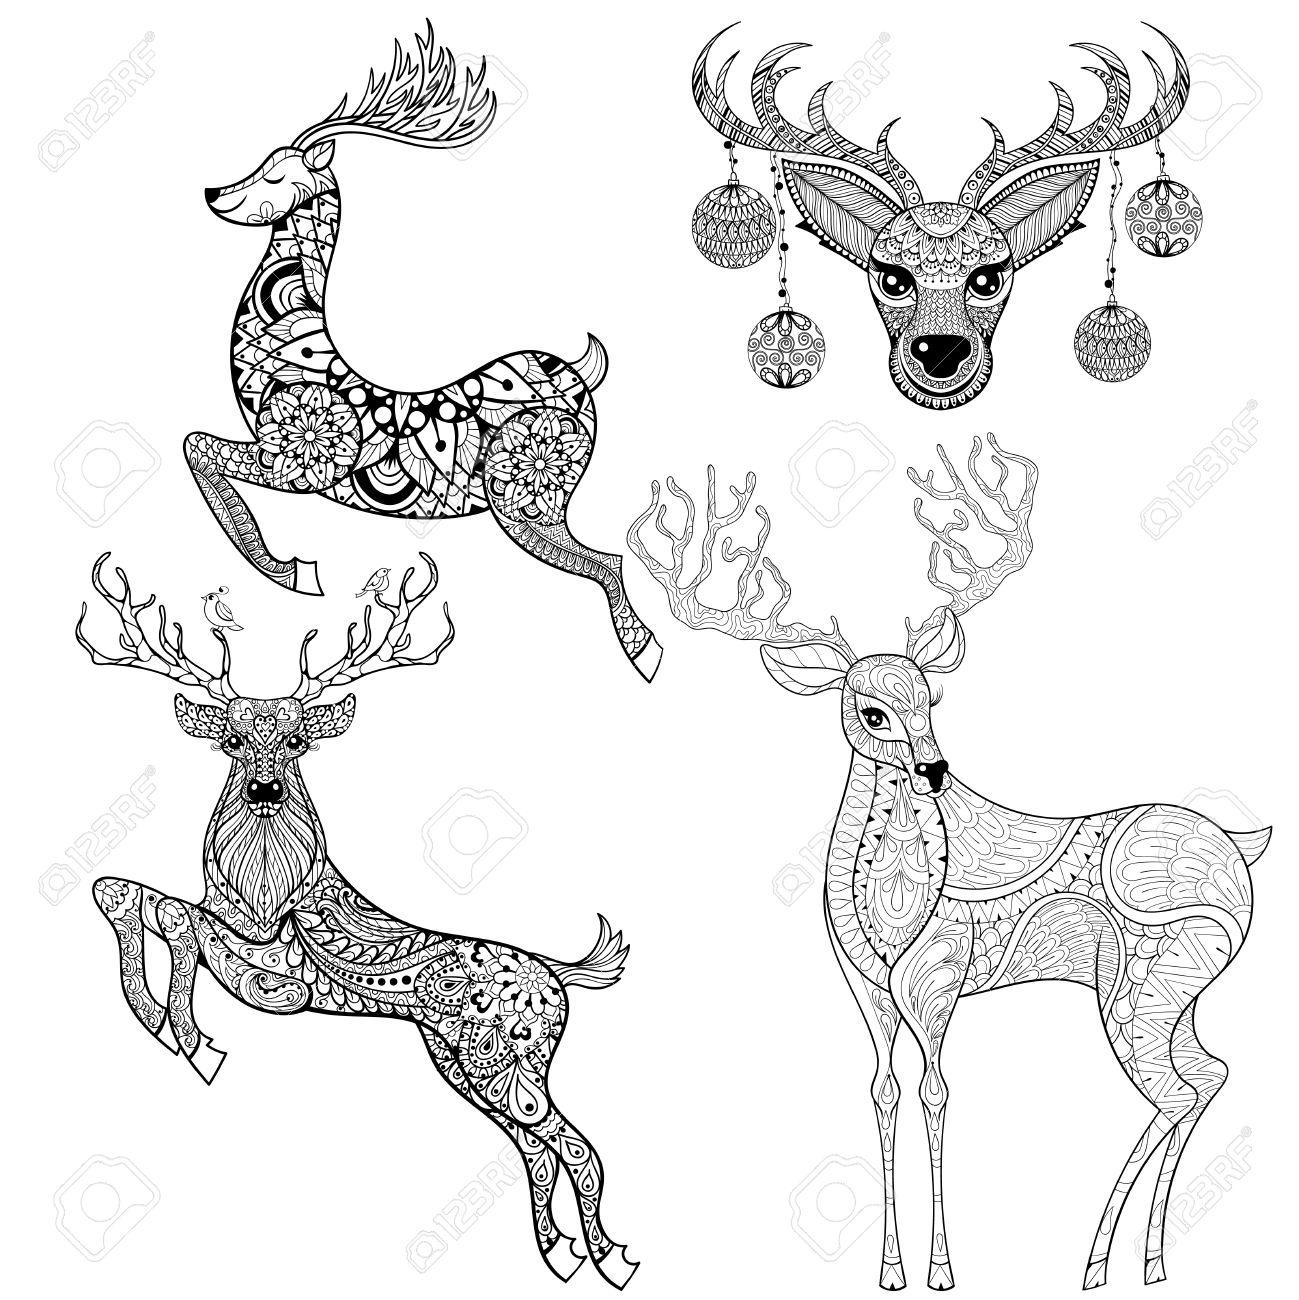 Dibujo Reno Navideo. Dibujos Para Colorear Navidad Animales Dibujo ...